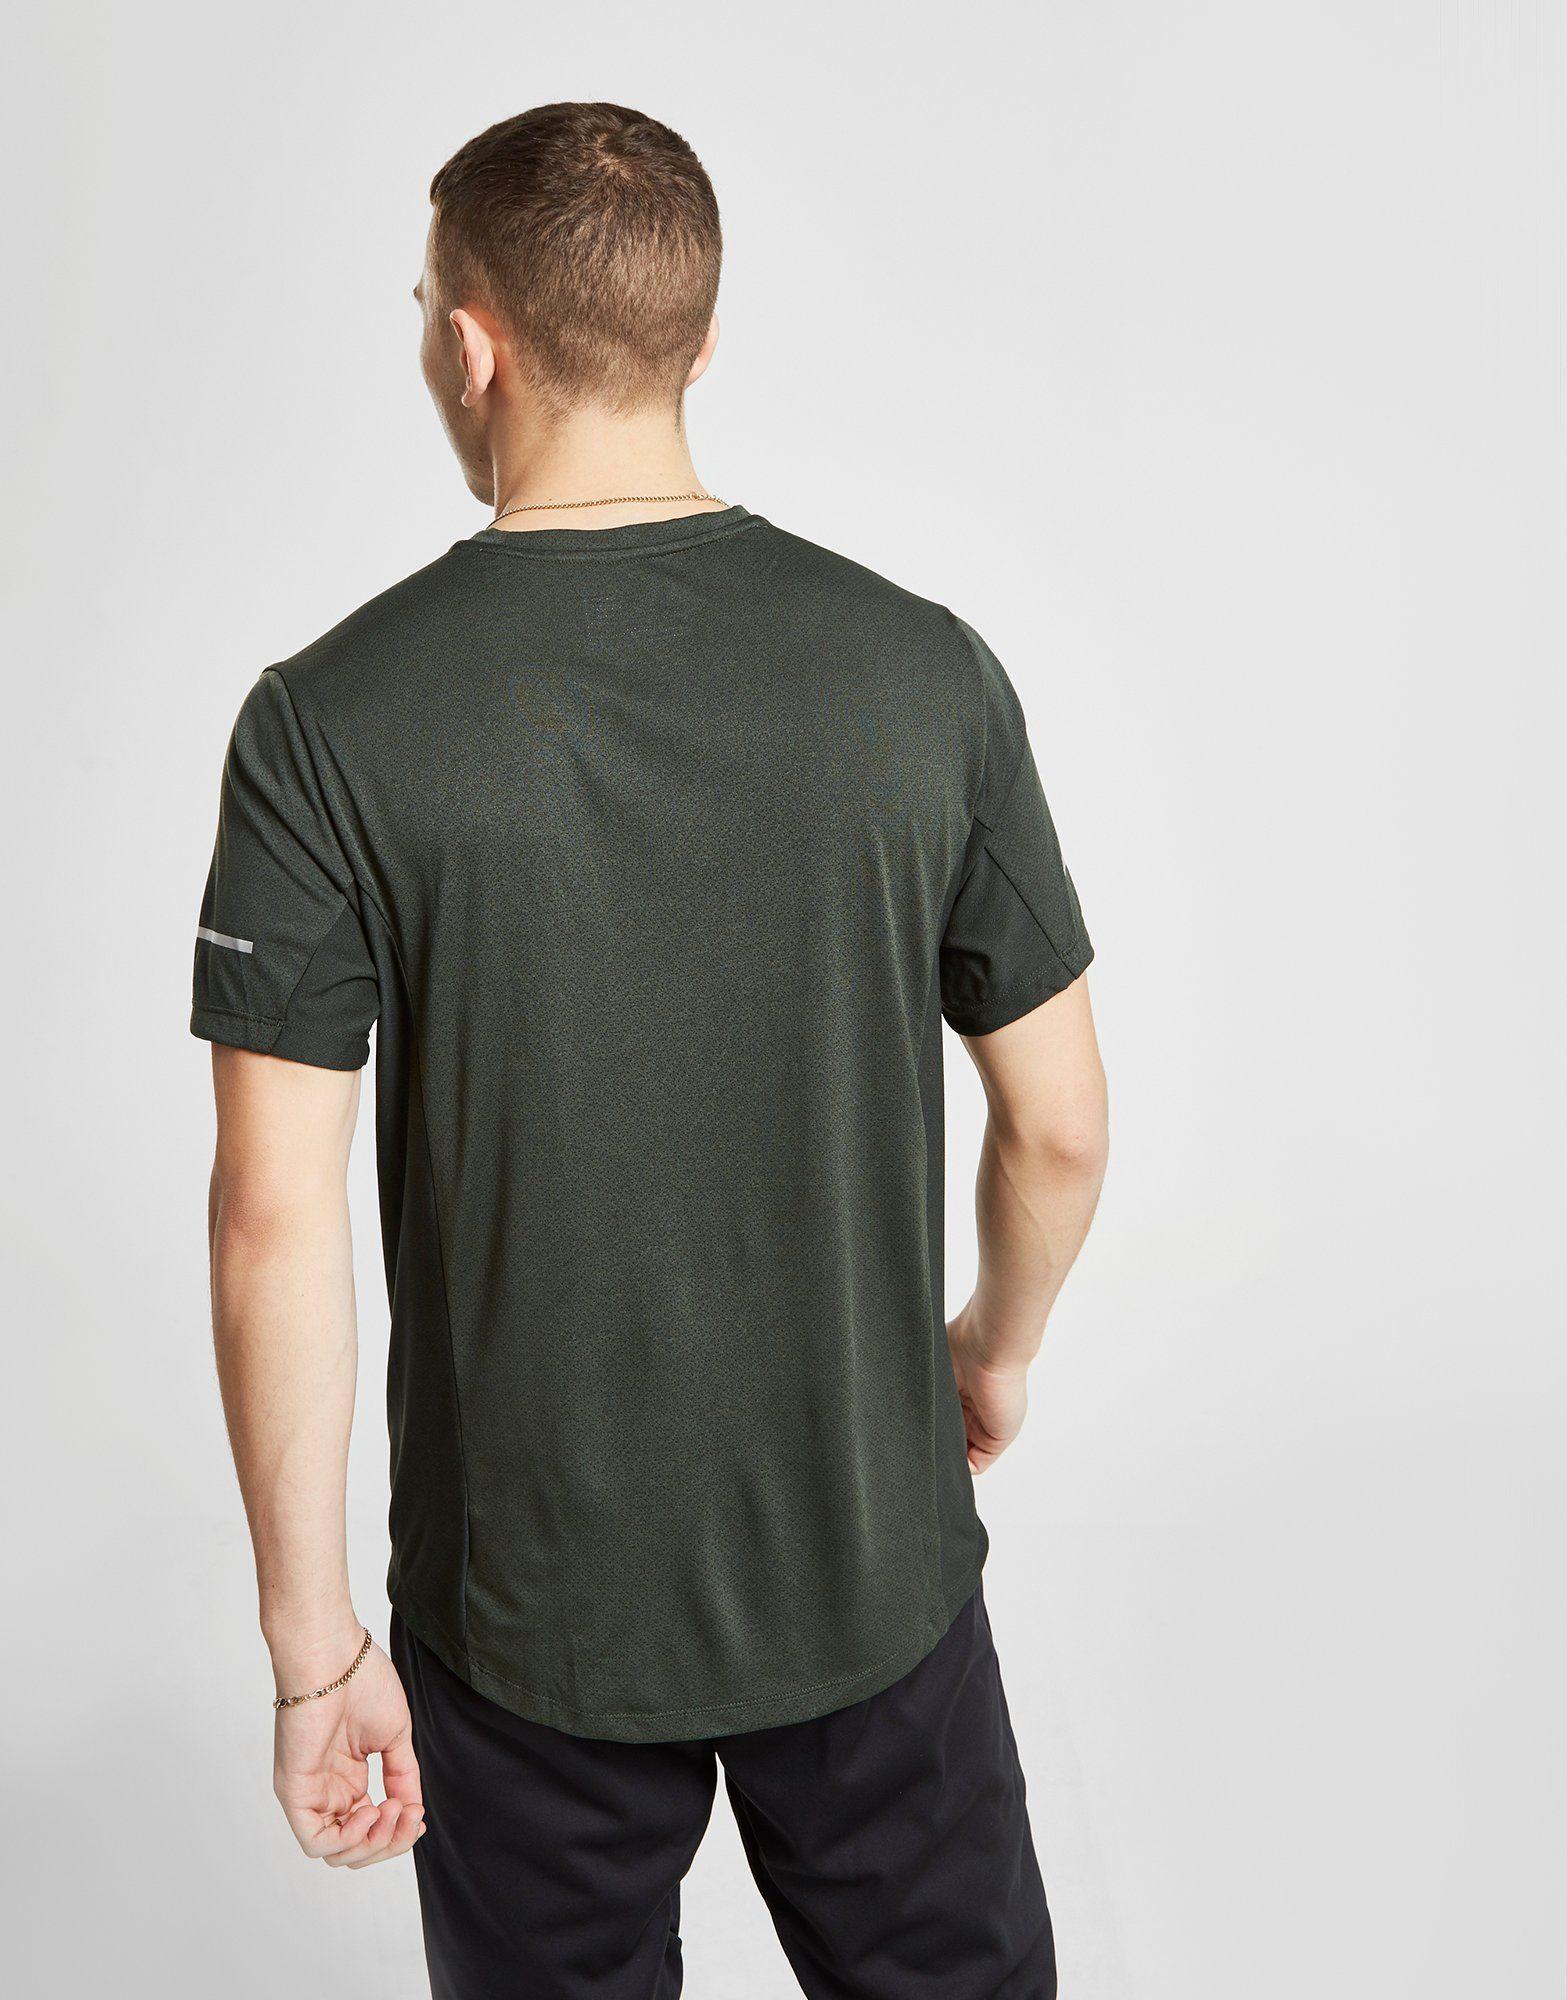 New Balance Breathe T-Shirt